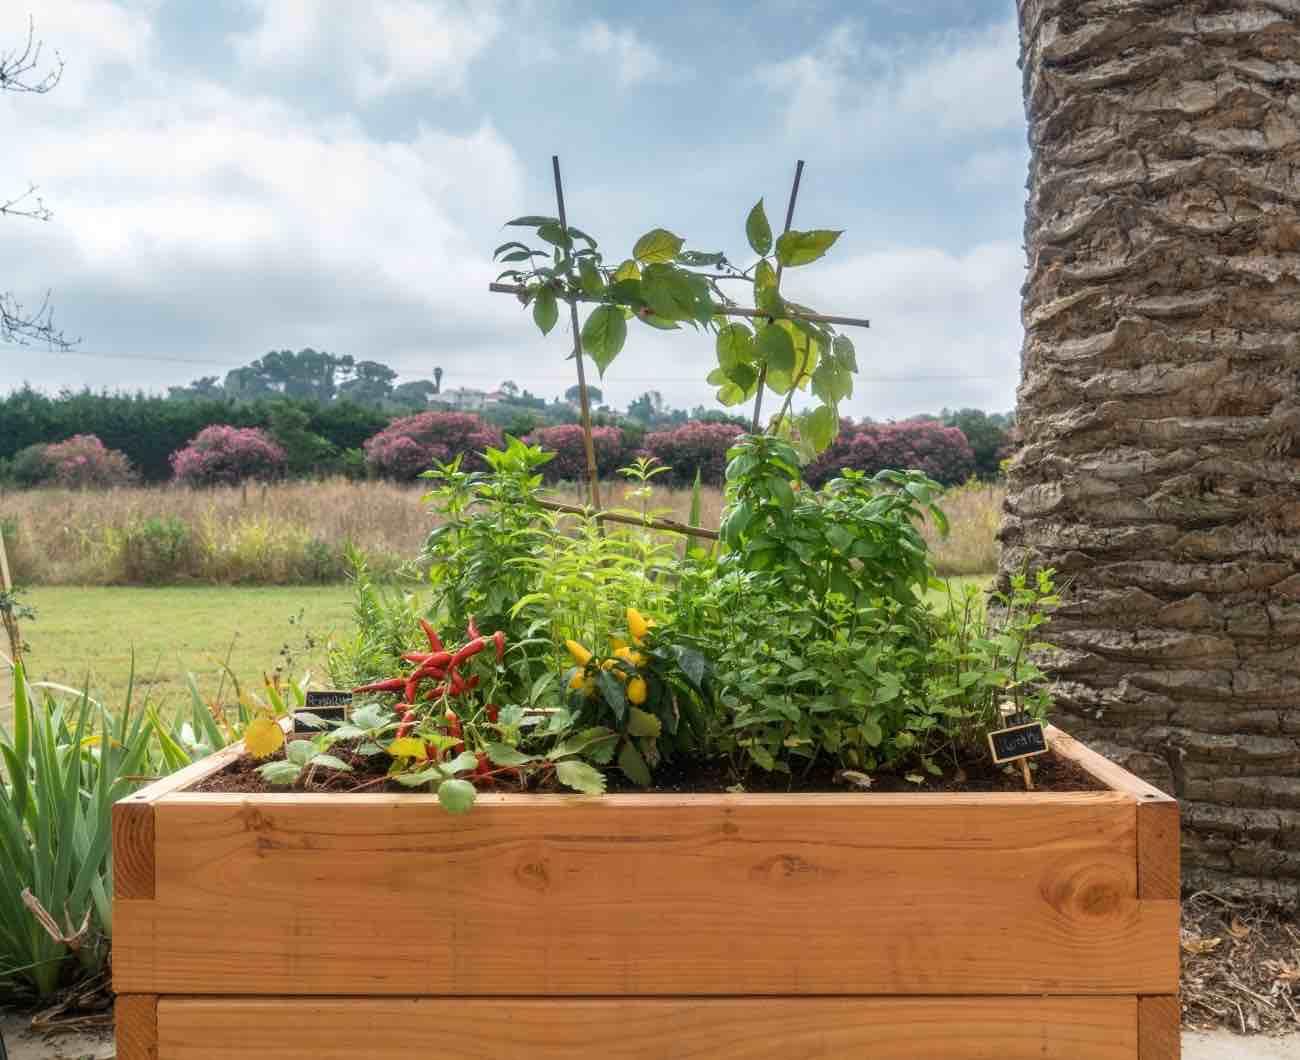 The Innovative Haut Potager Kitchen Garden Will Make You Crave Veggies